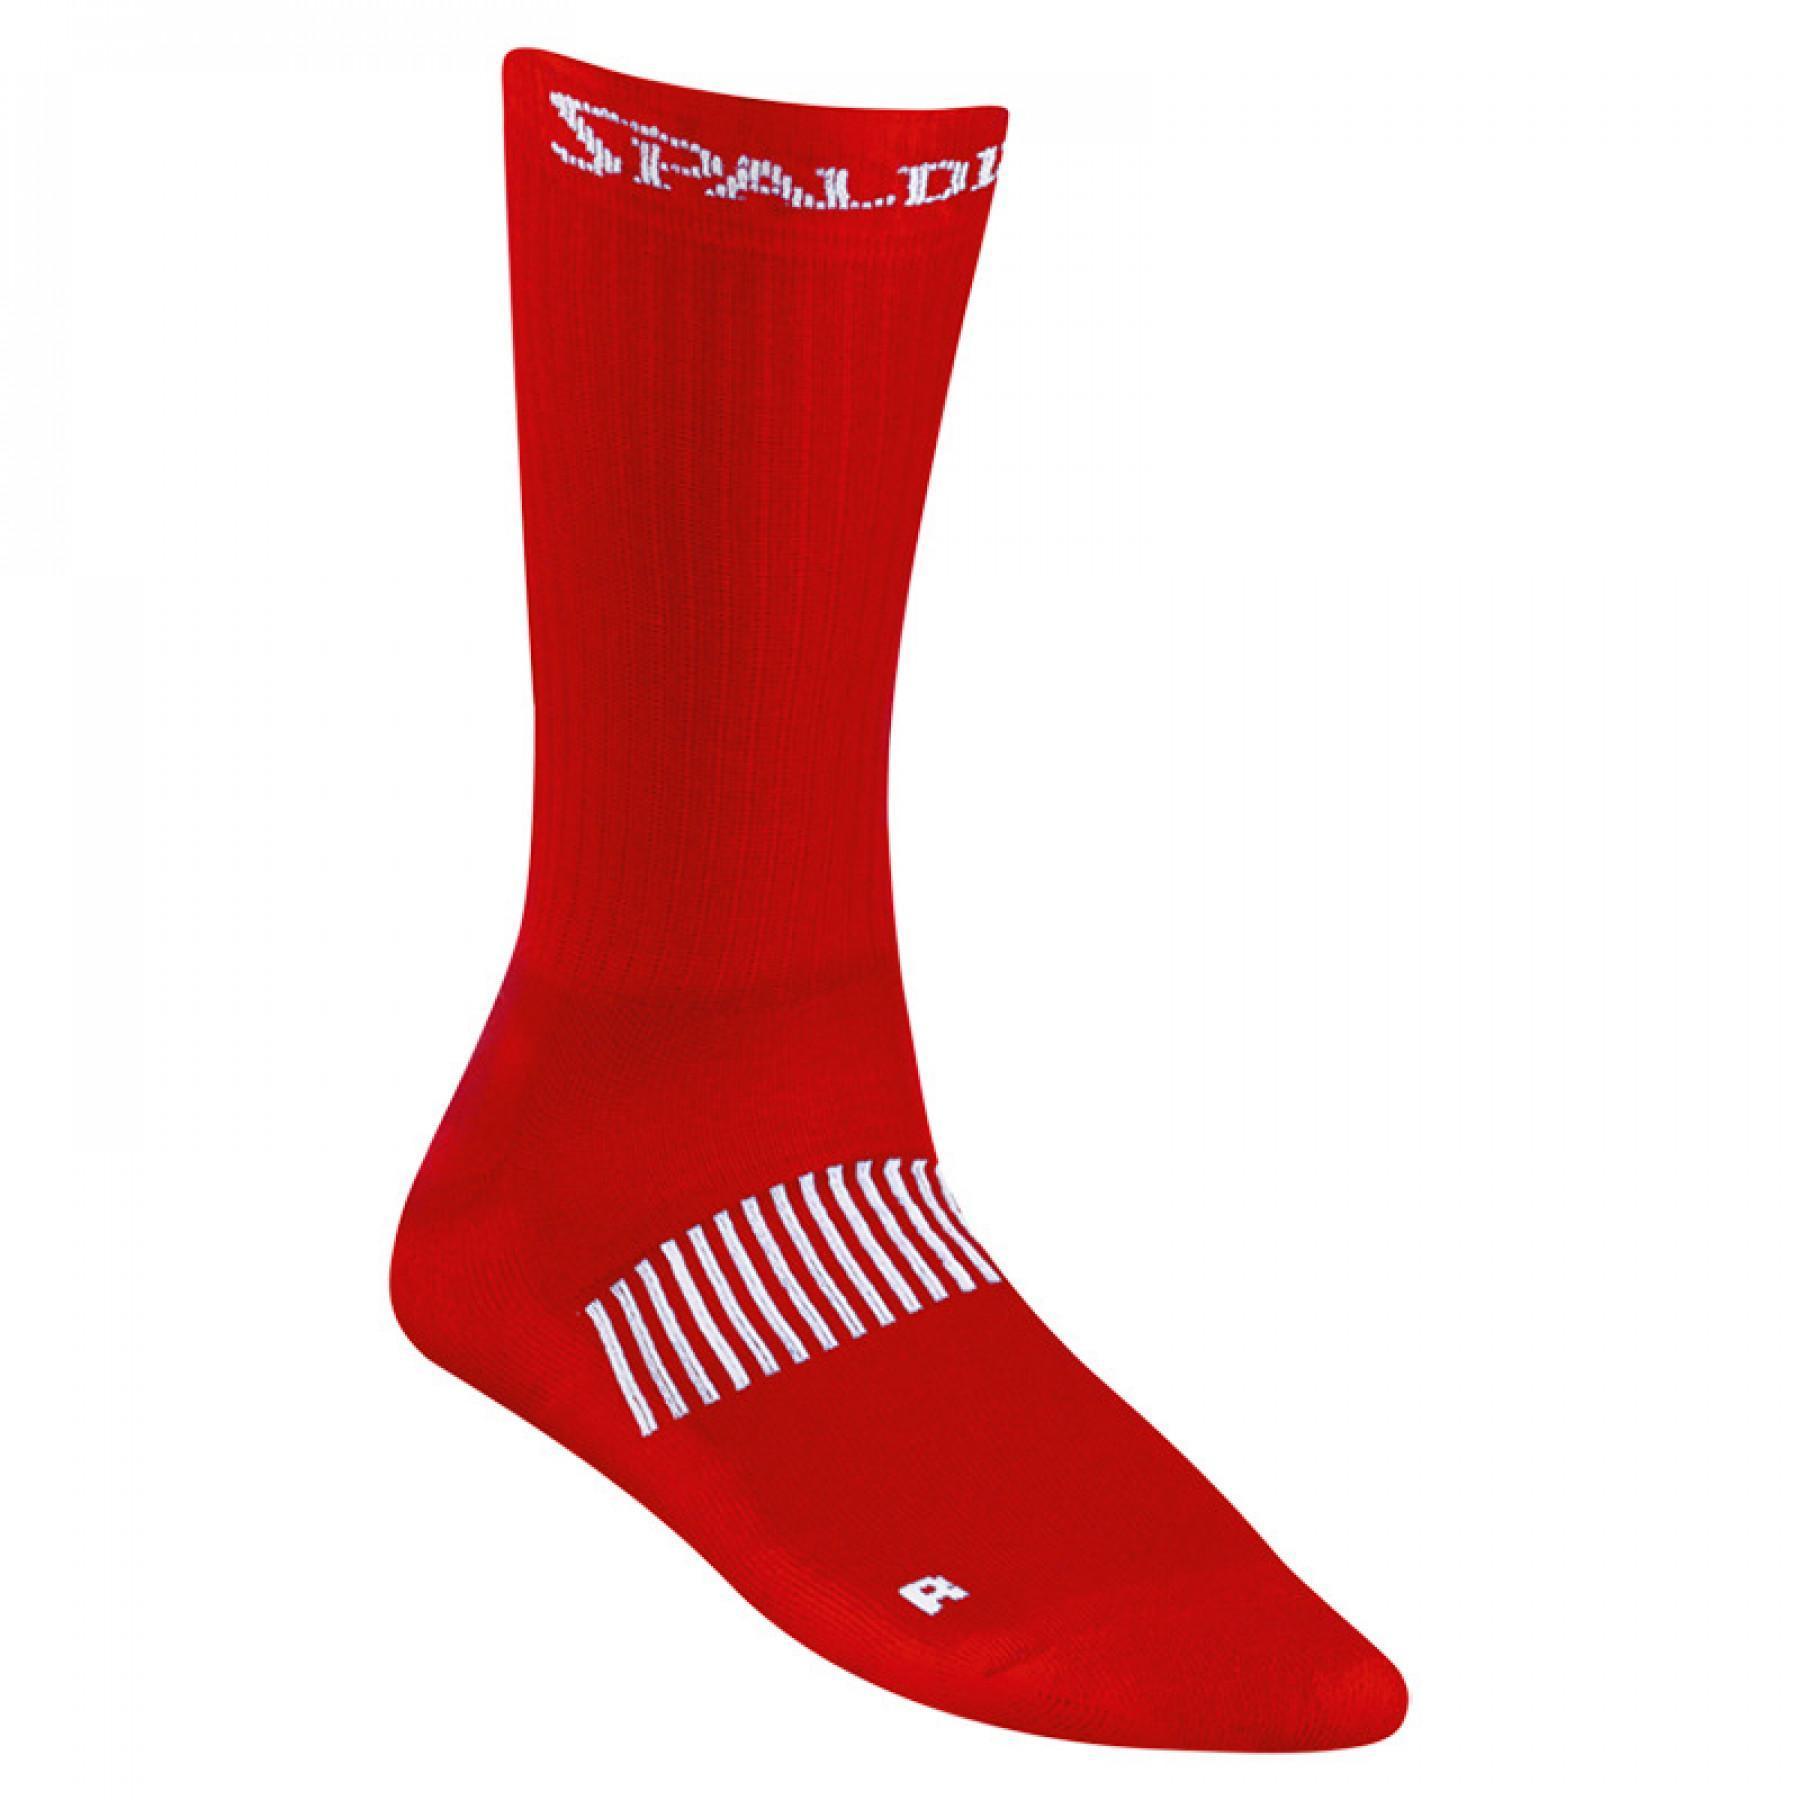 Spalding Coloured Socks